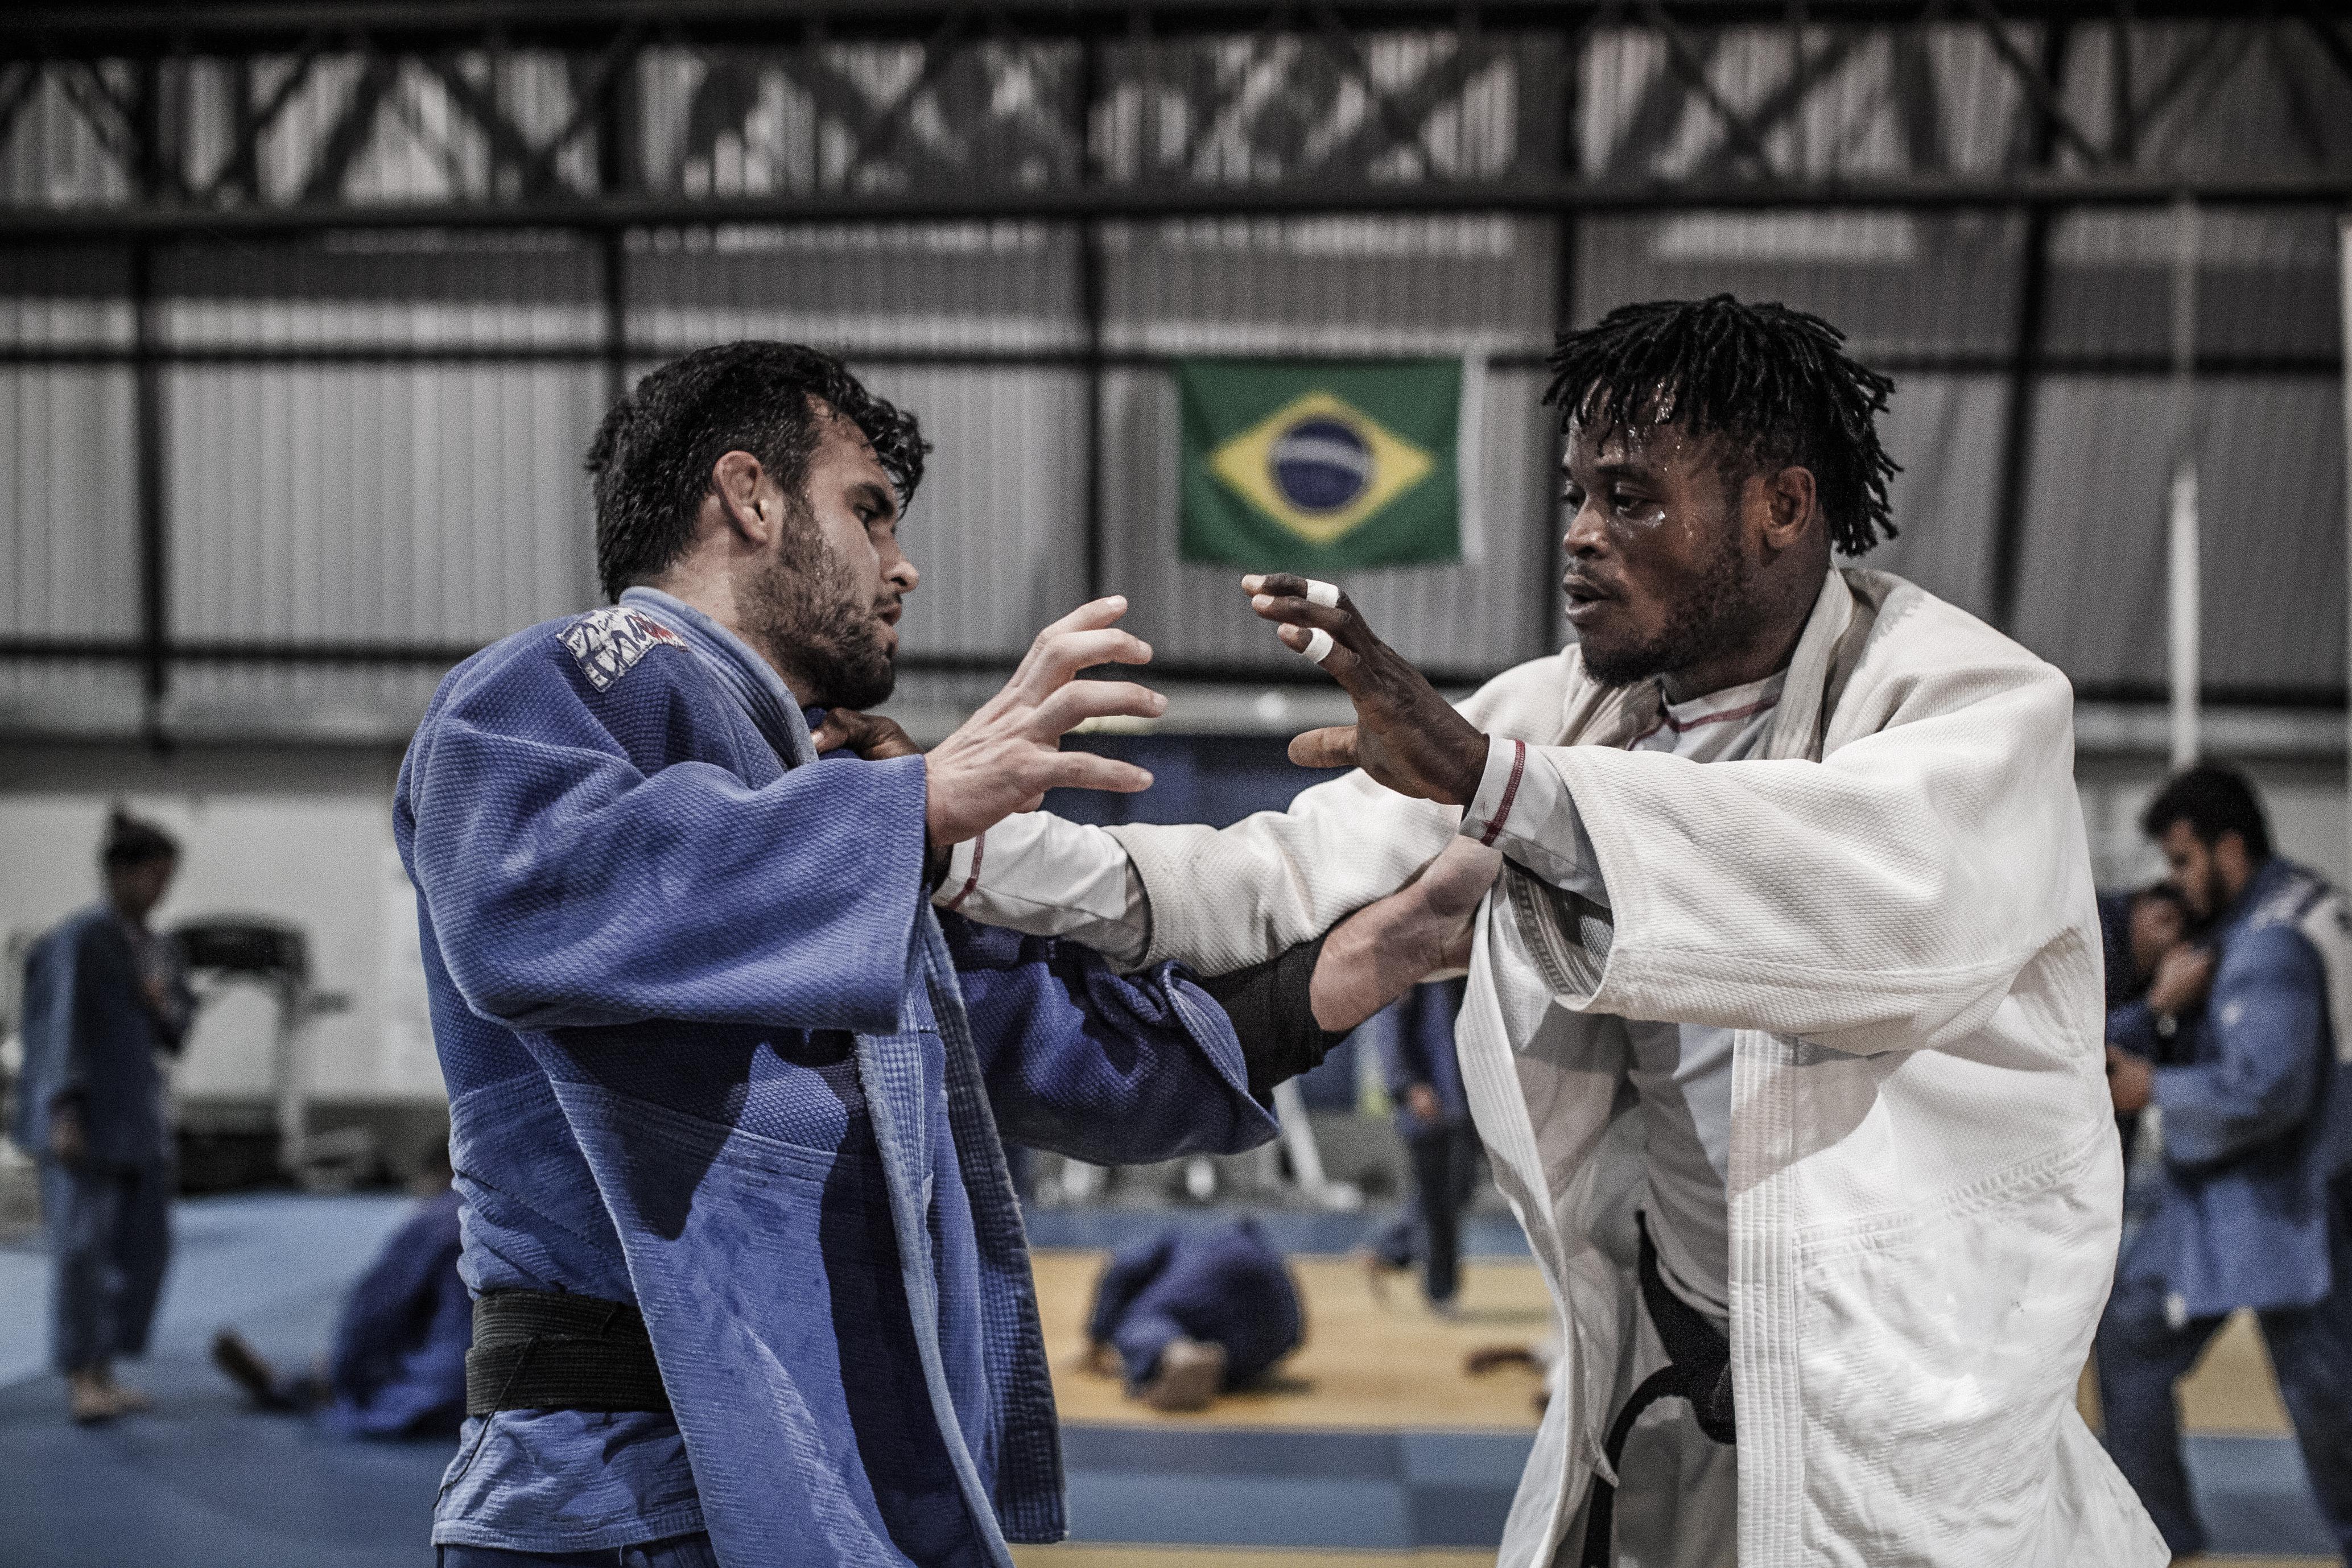 Brazil. Congolese judoka Popole Misenga trains for Rio 2016 Olympic Games